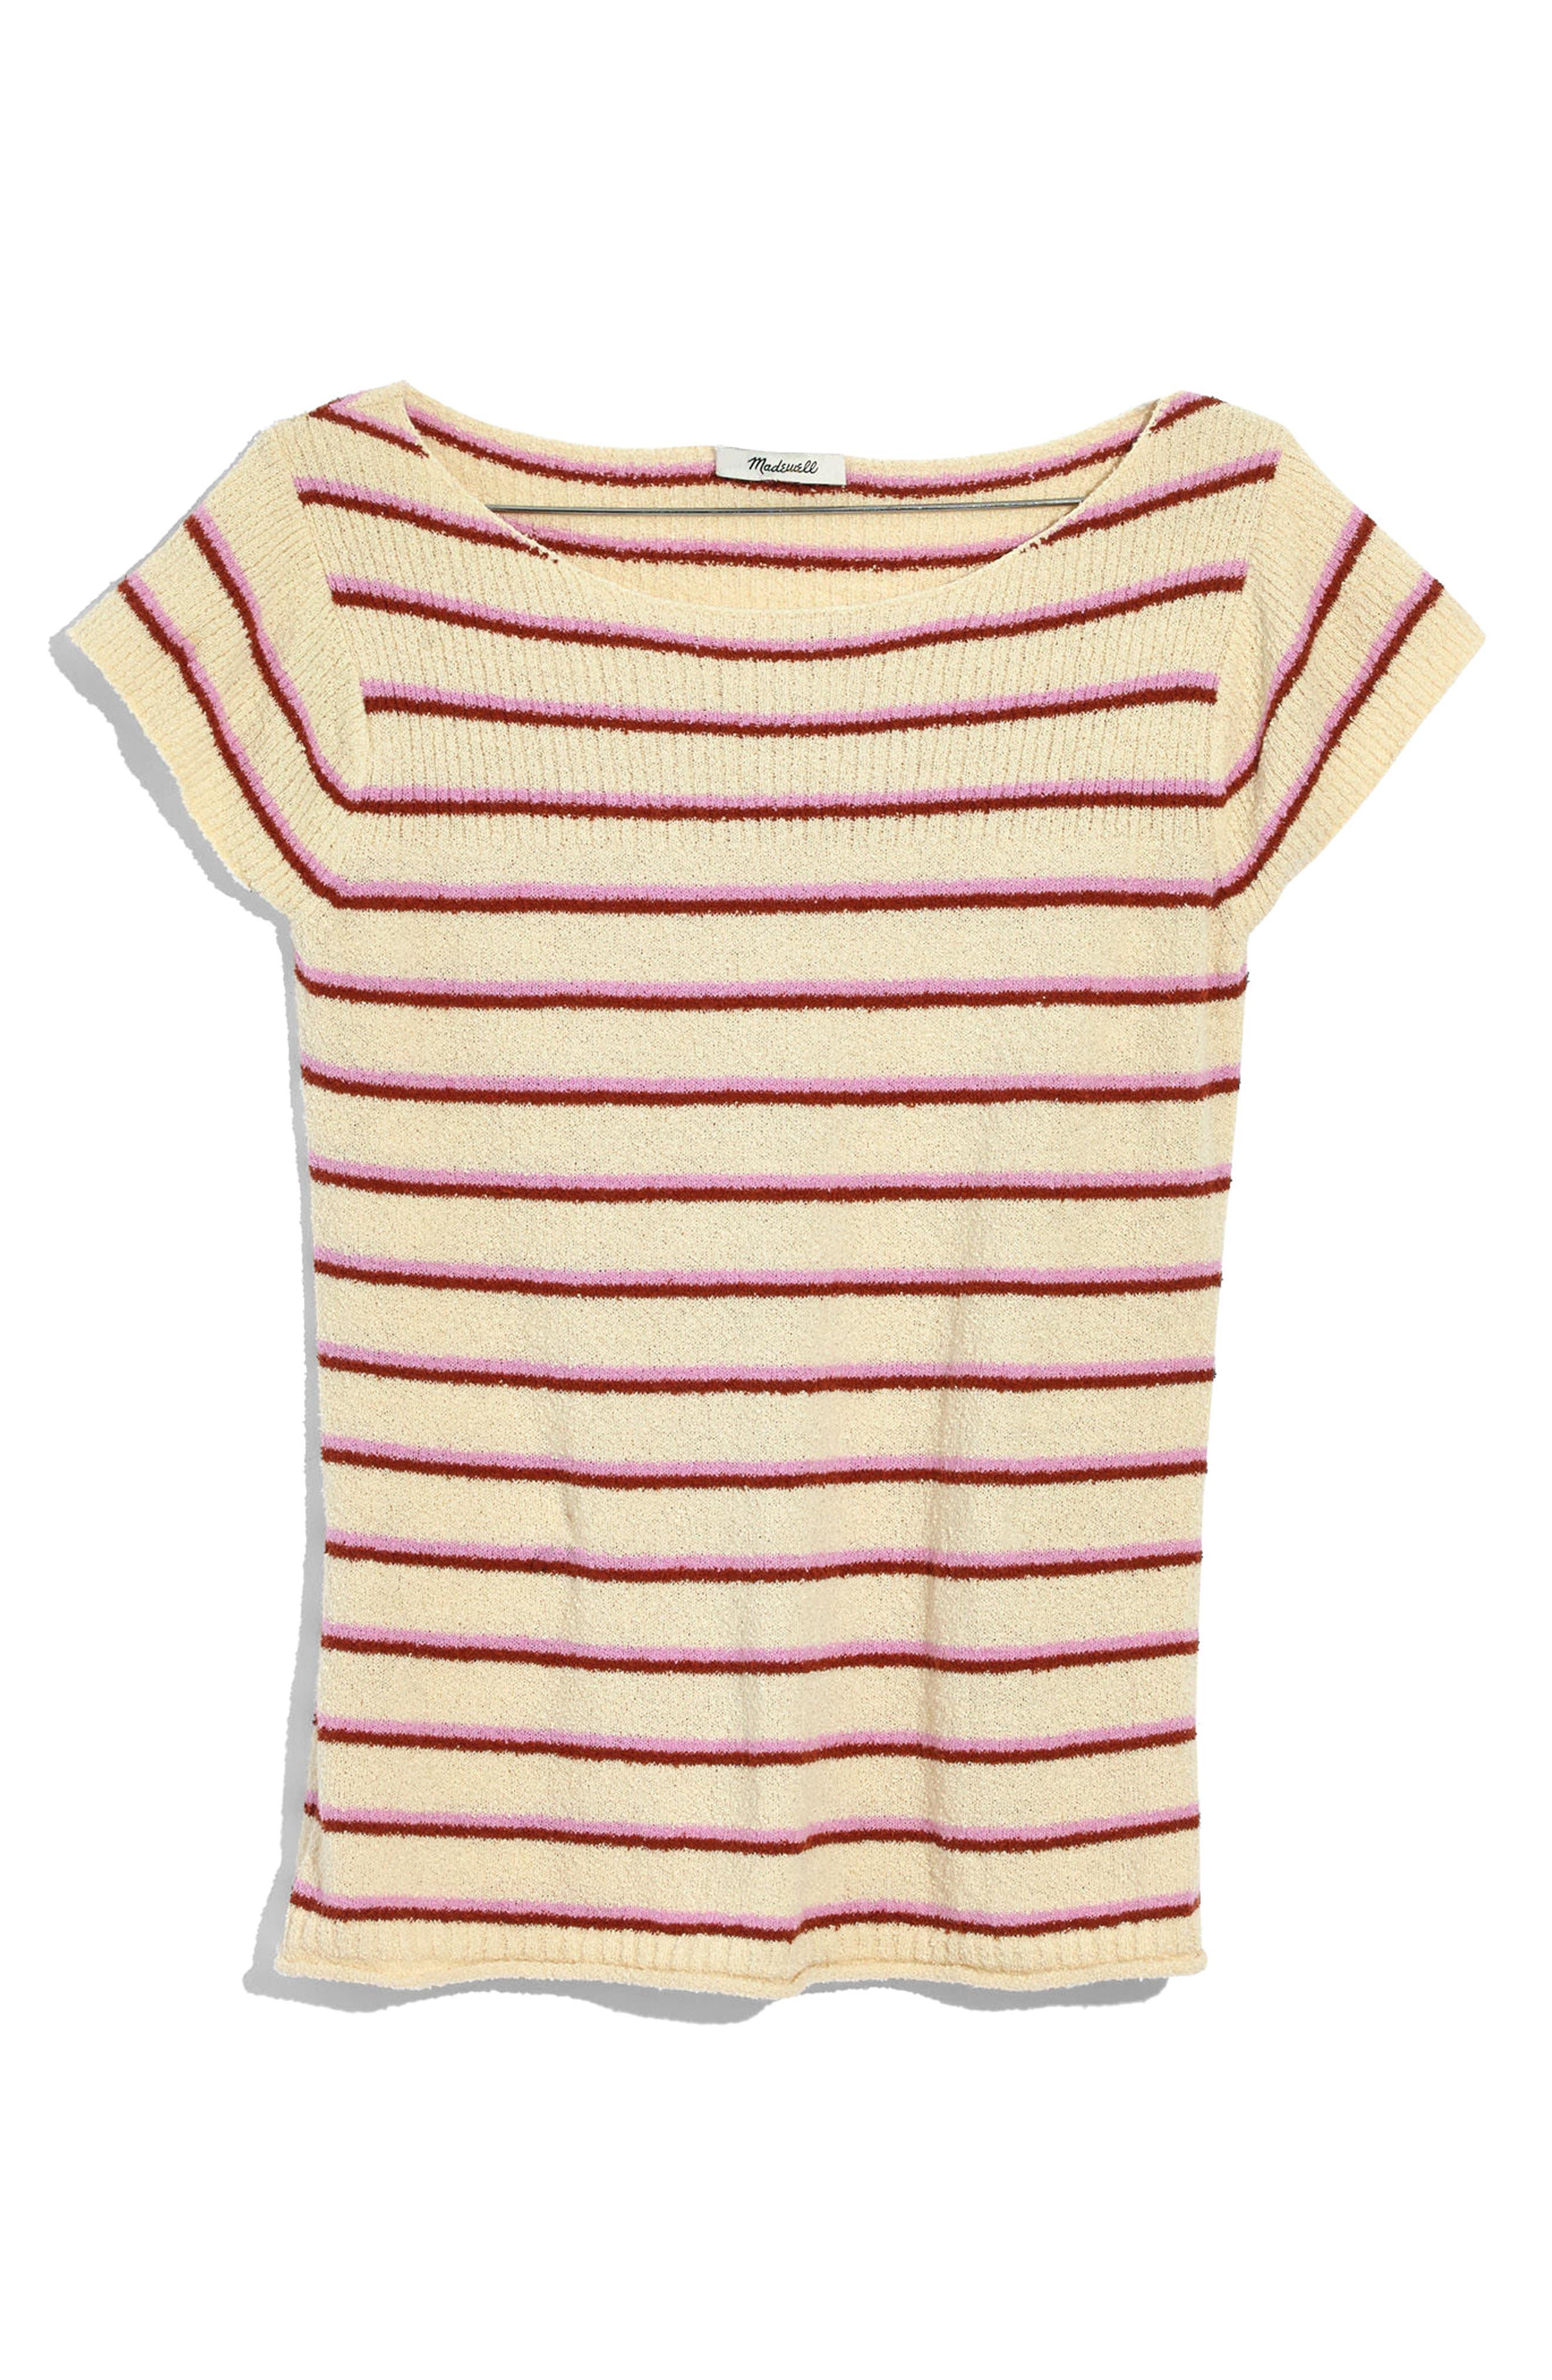 Marin Stripe Sweater Tee,                             Alternate thumbnail 3, color,                             100